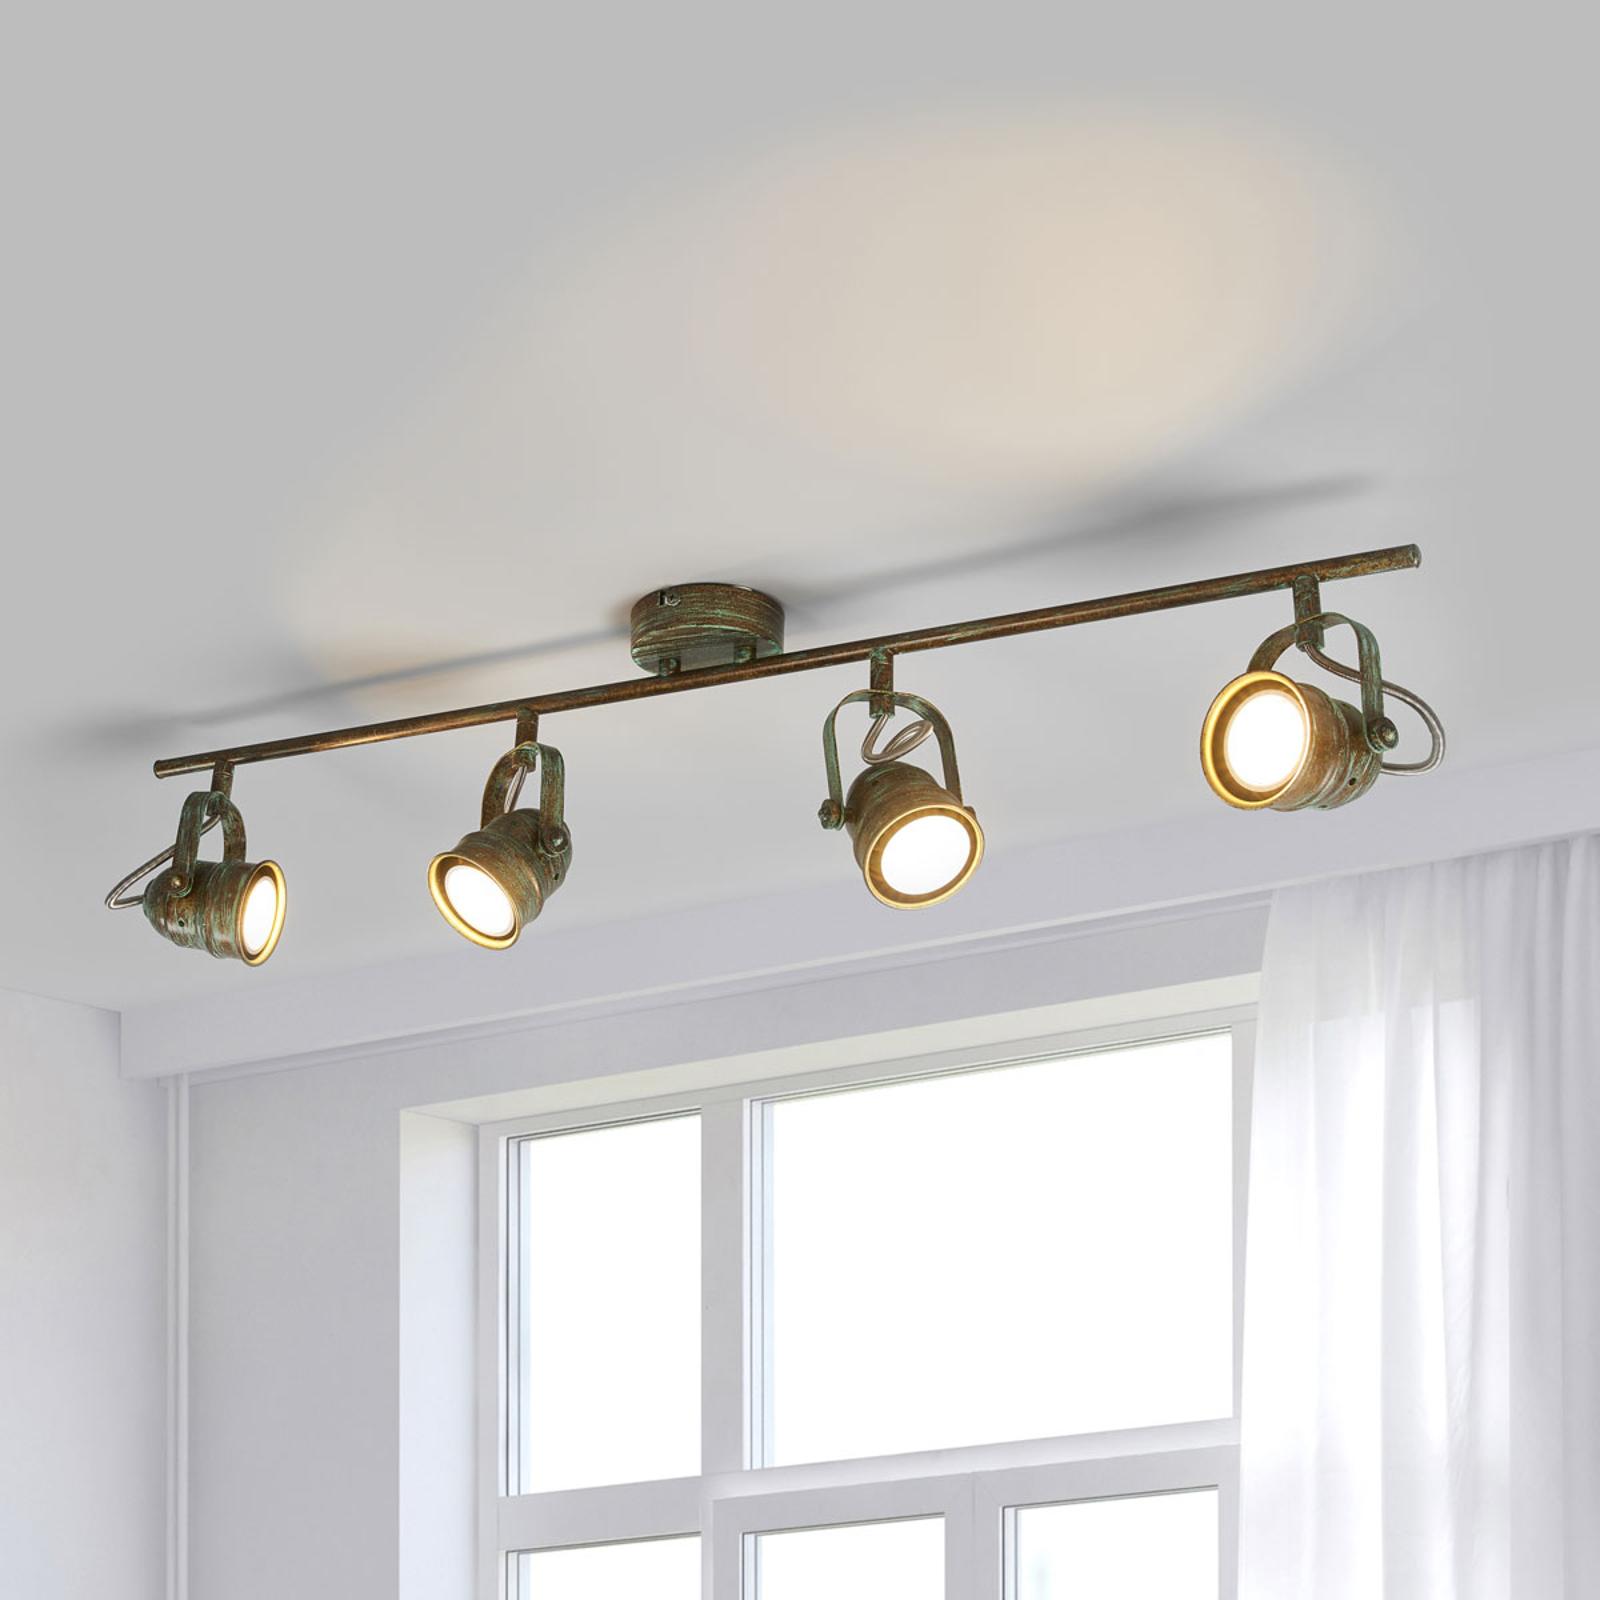 Antique-looking LED ceiling spotlight Leonor_9639071_1